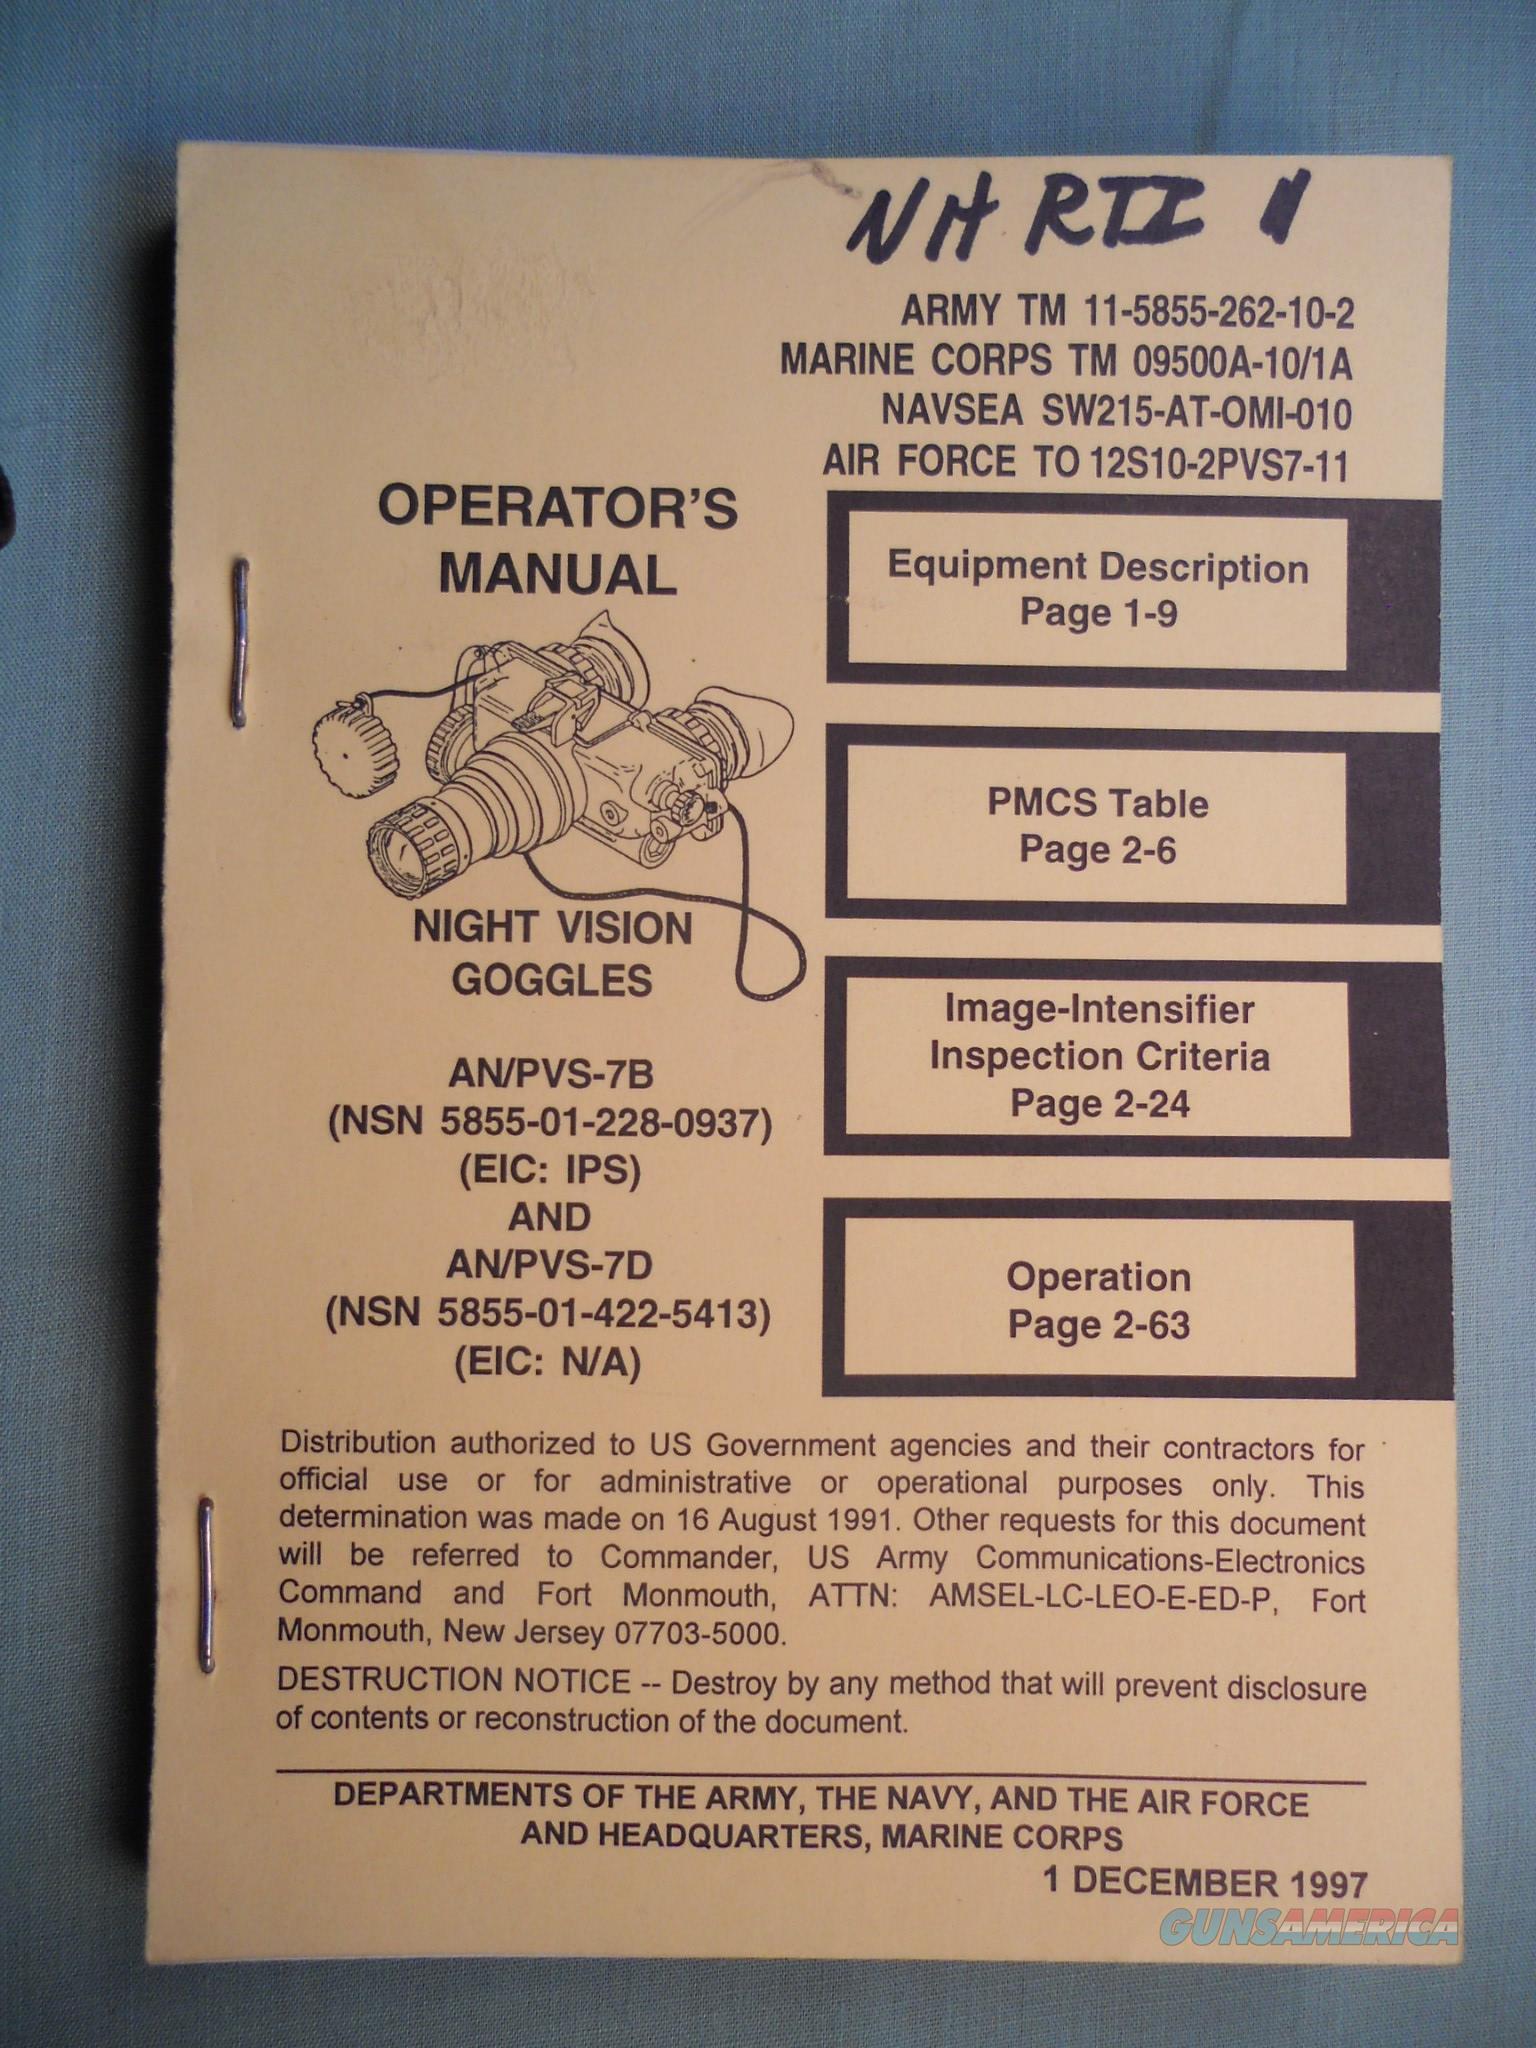 Operator's manual : night vision goggle, AN/PVS-7B TM 11-5855-262-10-2  Non-Guns > Night Vision